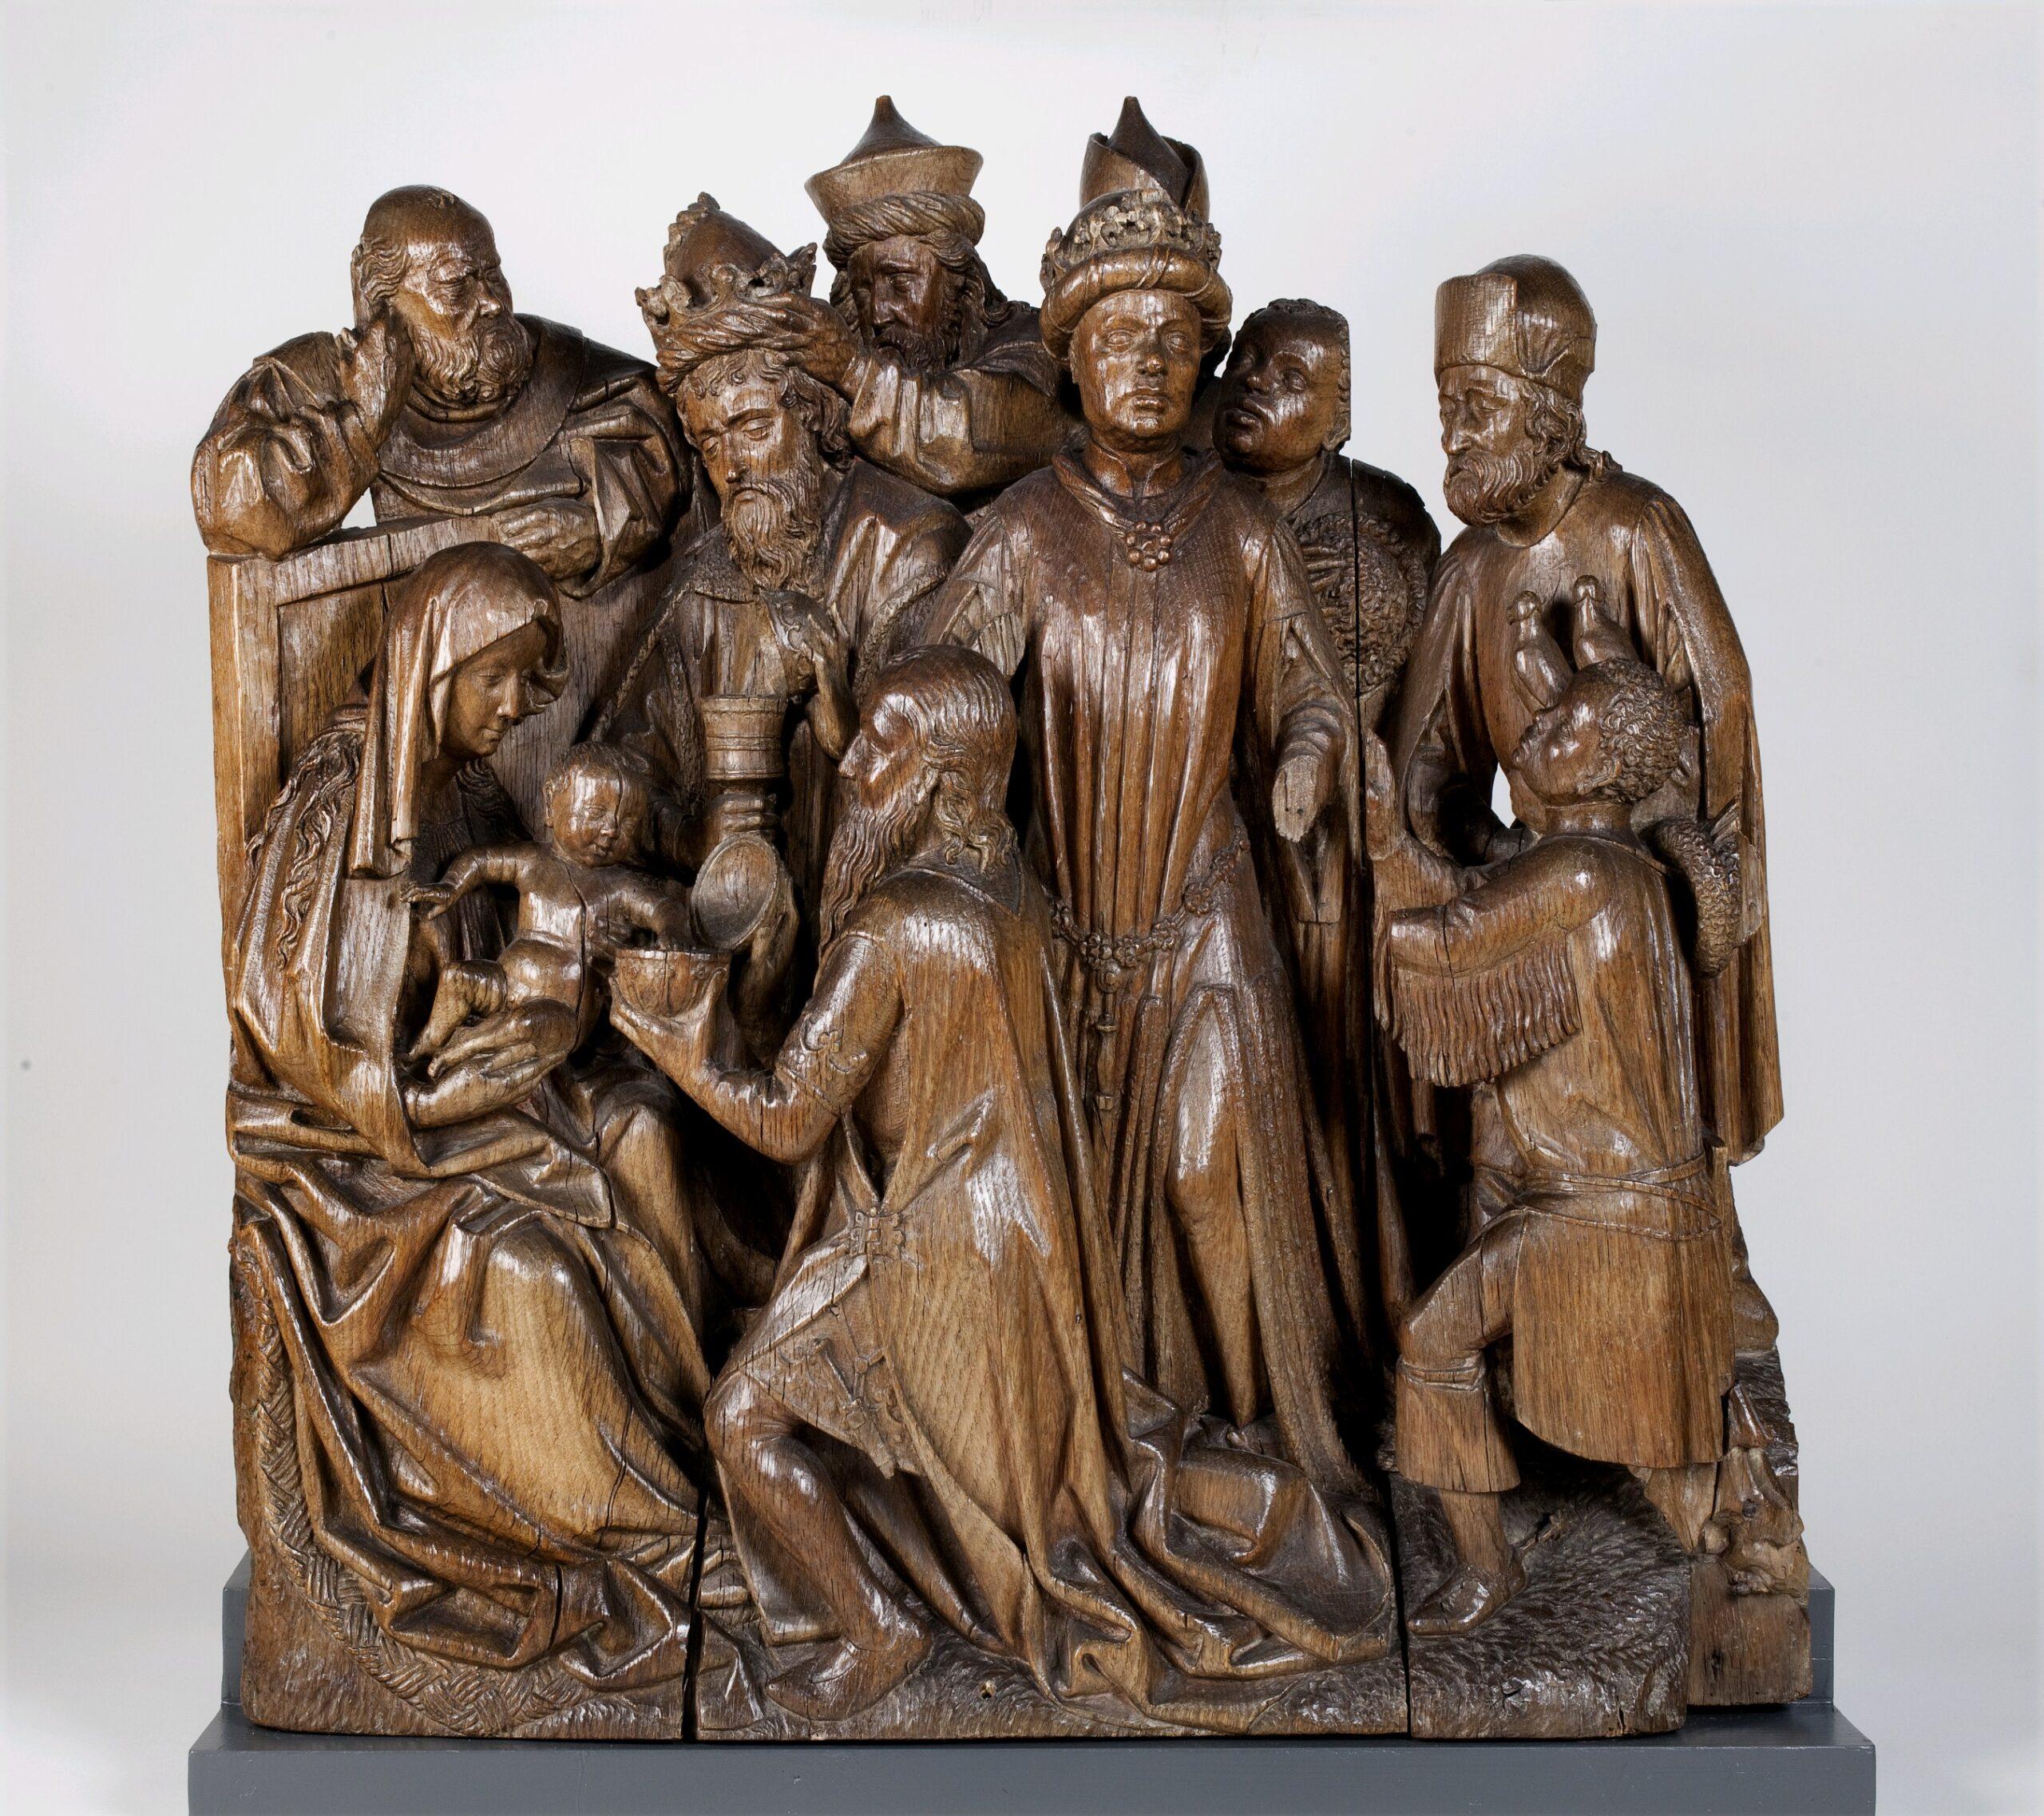 The Adoration of the Magi, Utrecht, ca. 1460Museum Catharijneconvent, Utrecht